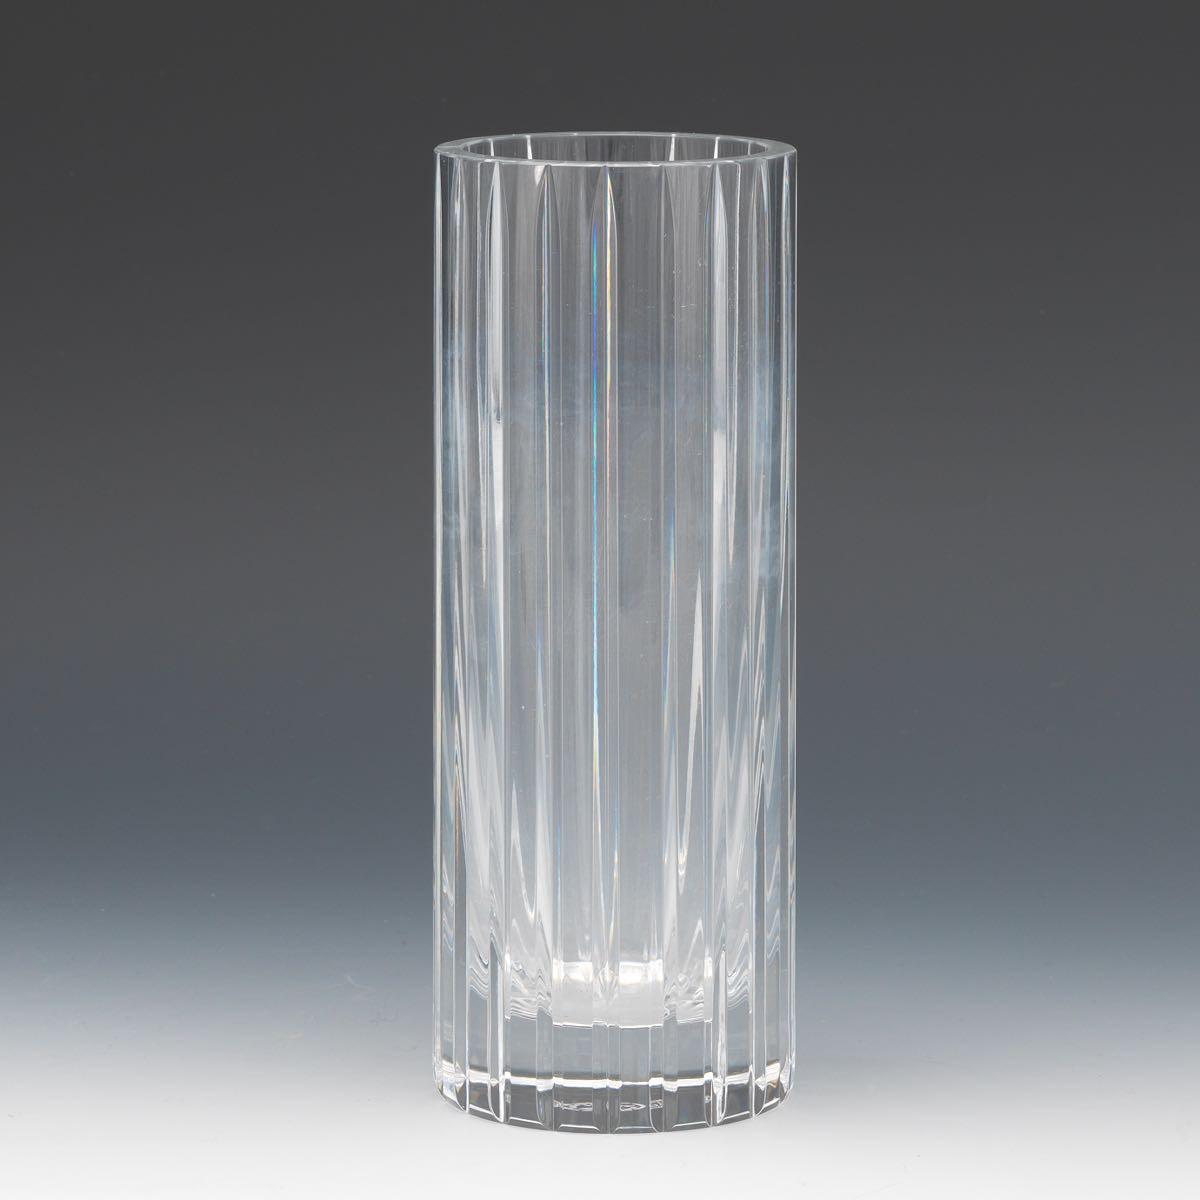 baccarat harmonie bud vase of baccarat vase harmonie 09 03 15 sold 184 for baccarat vase harmonie